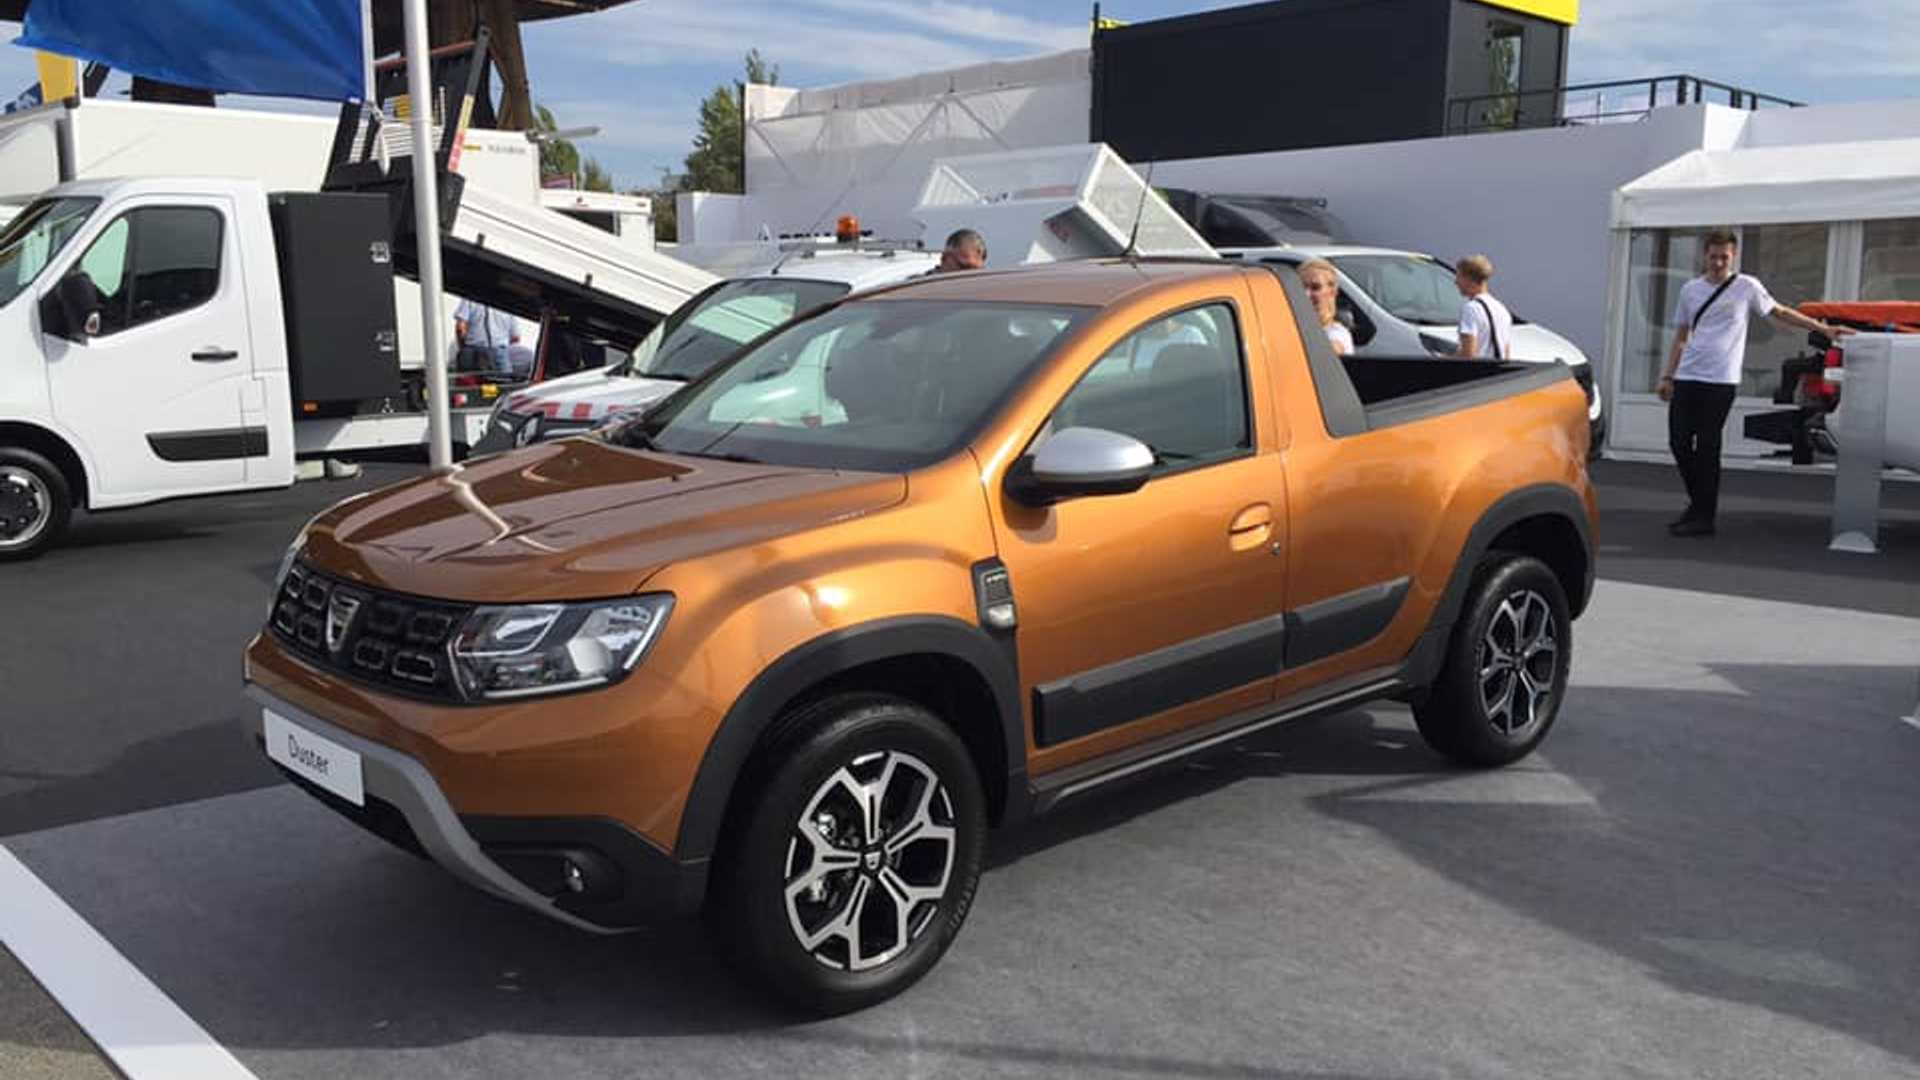 Dacia Duster u pikap varijanti spreman za premijeru